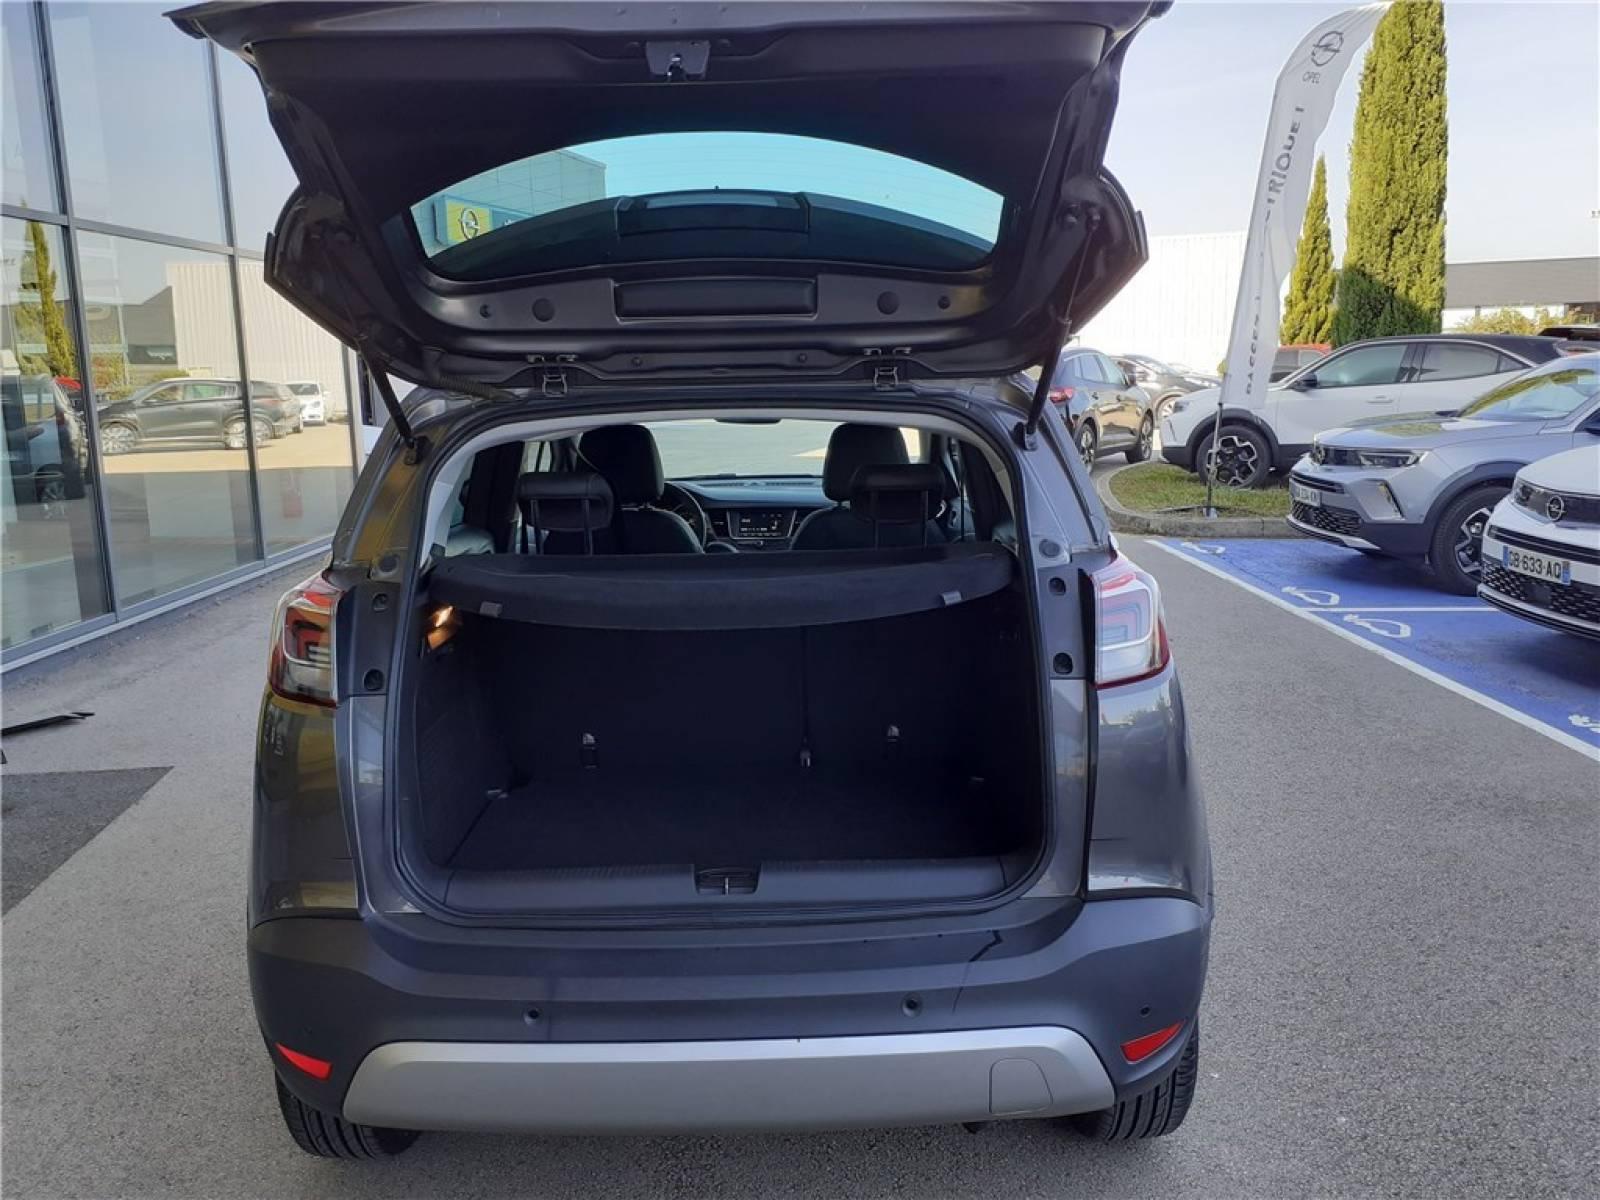 OPEL Crossland X 1.2 Turbo 110 ch - véhicule d'occasion - Groupe Guillet - Opel Magicauto - Chalon-sur-Saône - 71380 - Saint-Marcel - 10